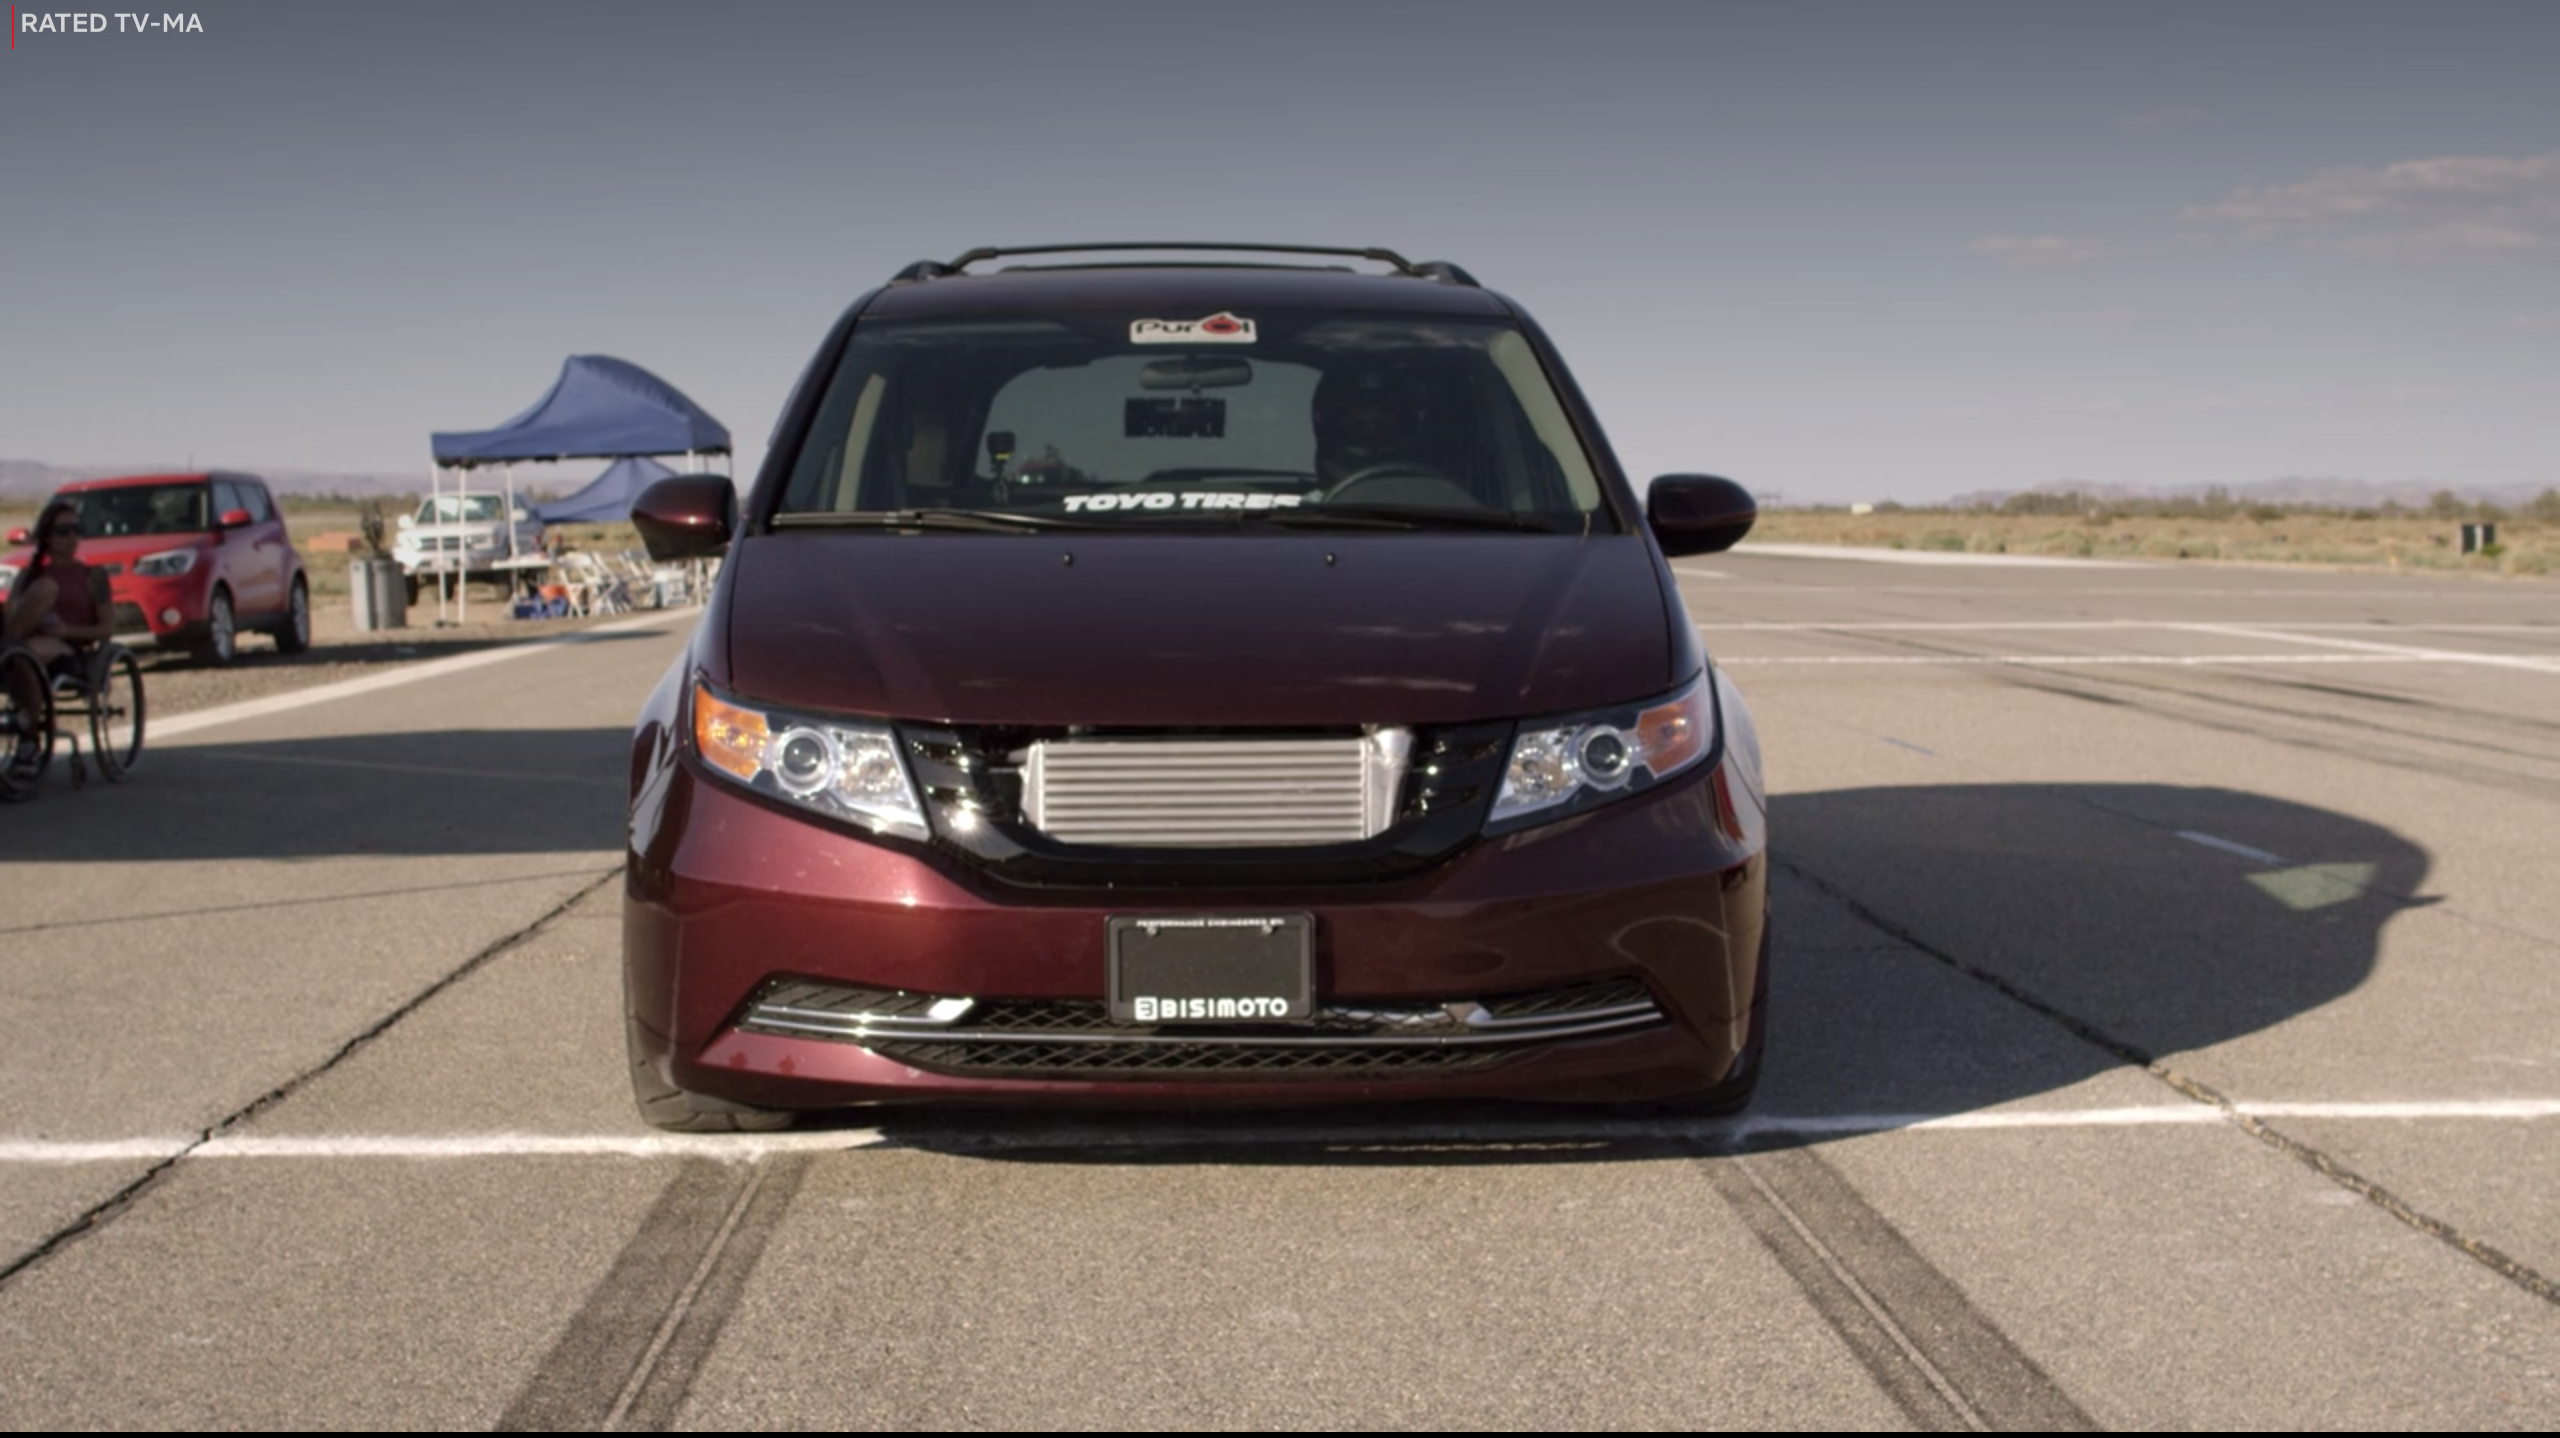 Netflix Fastest car bisimoto honda odyssey 1000 hp Front